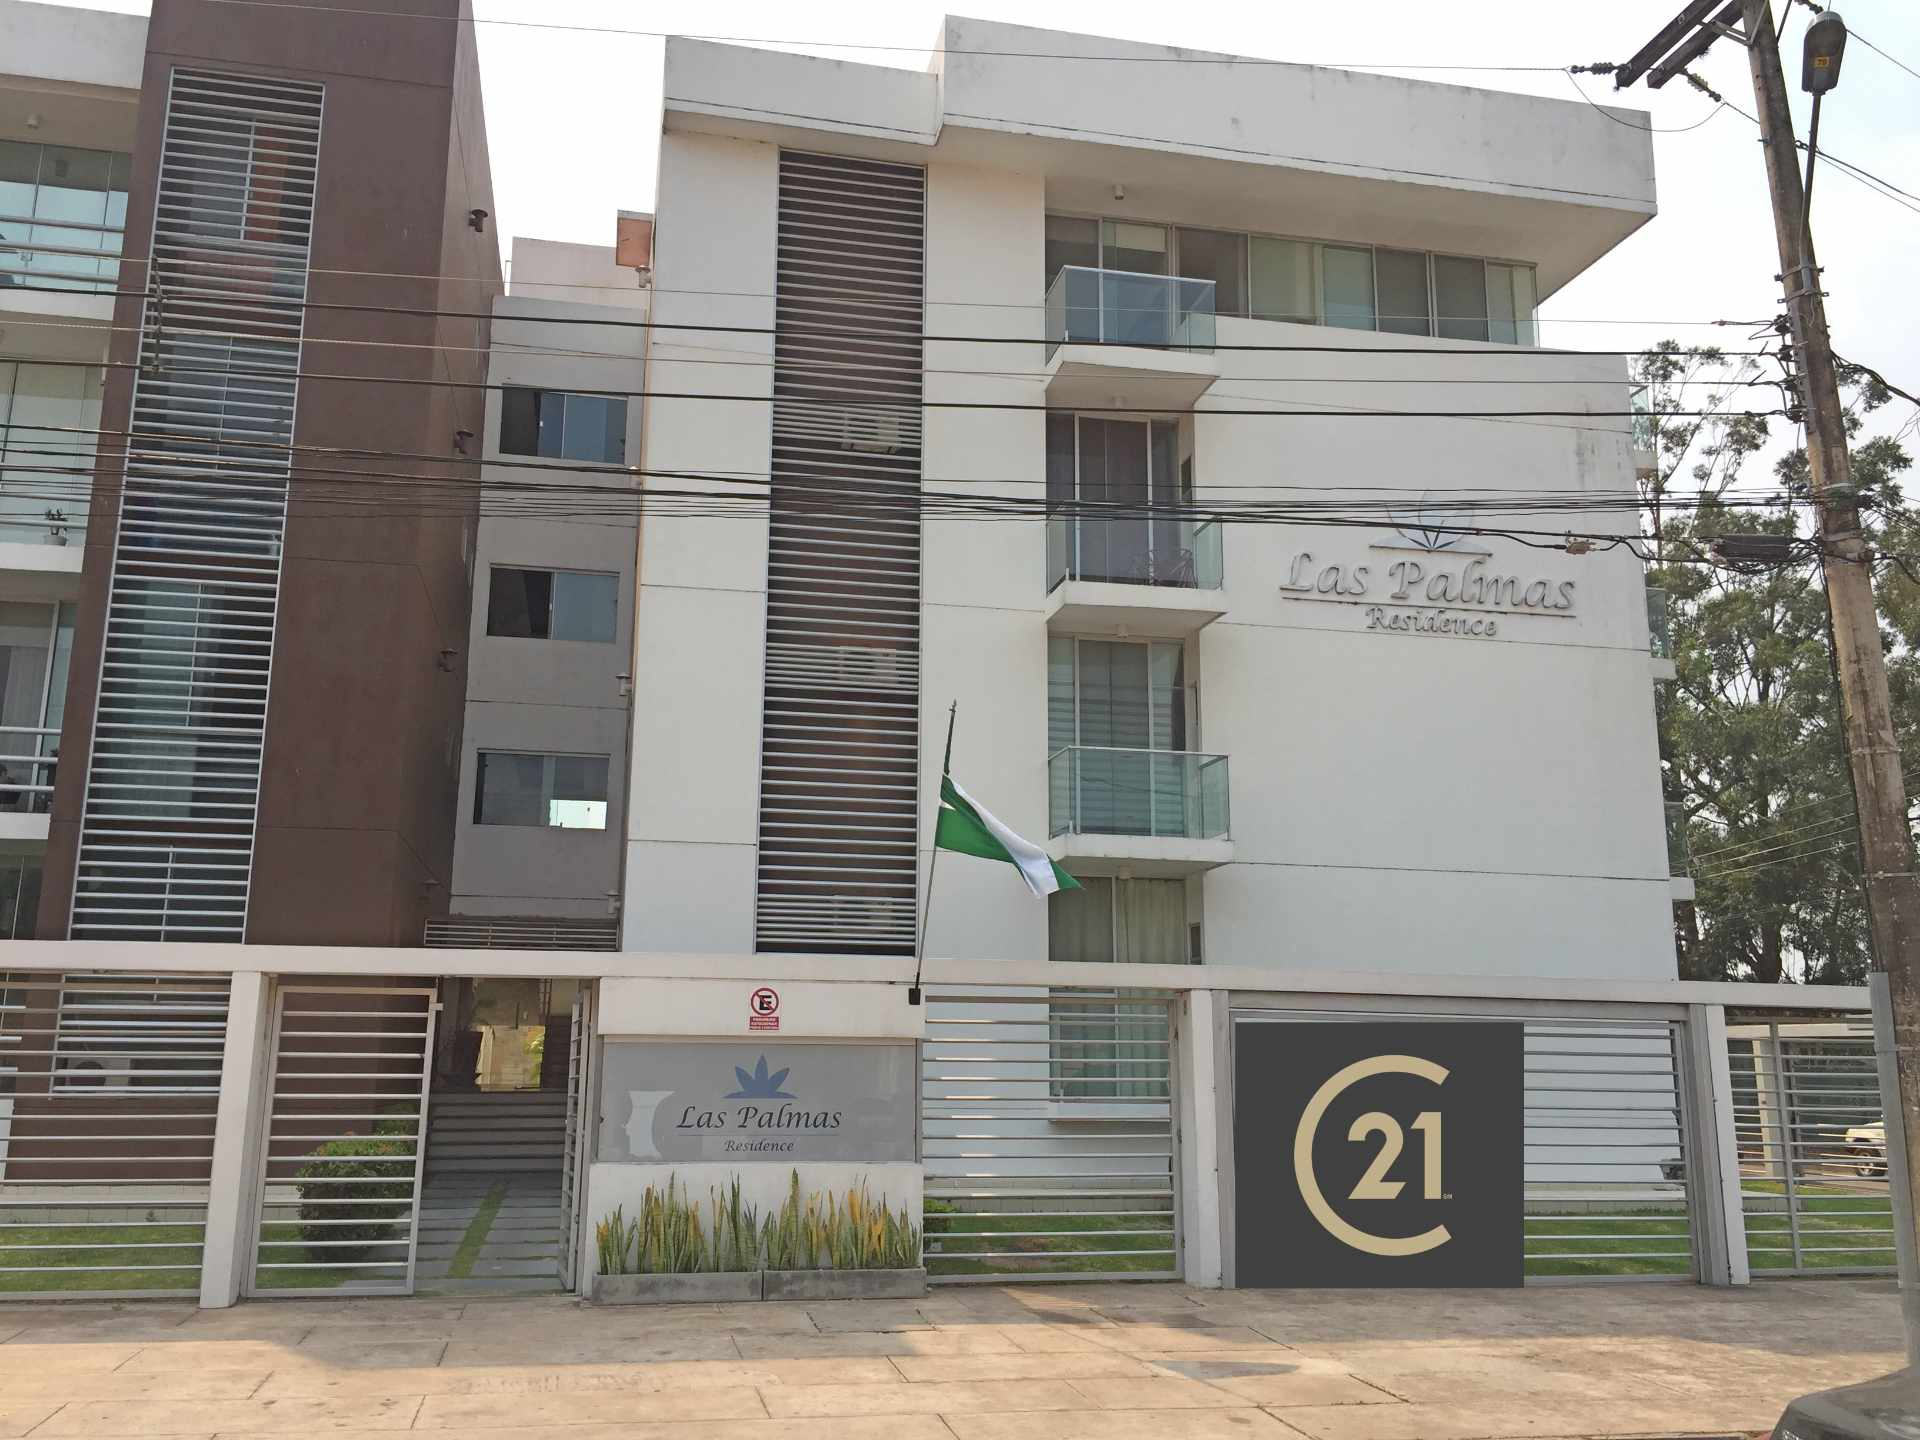 Departamento en Alquiler Calle Yaguarú, Condominio Las Palmas Residence Foto 1